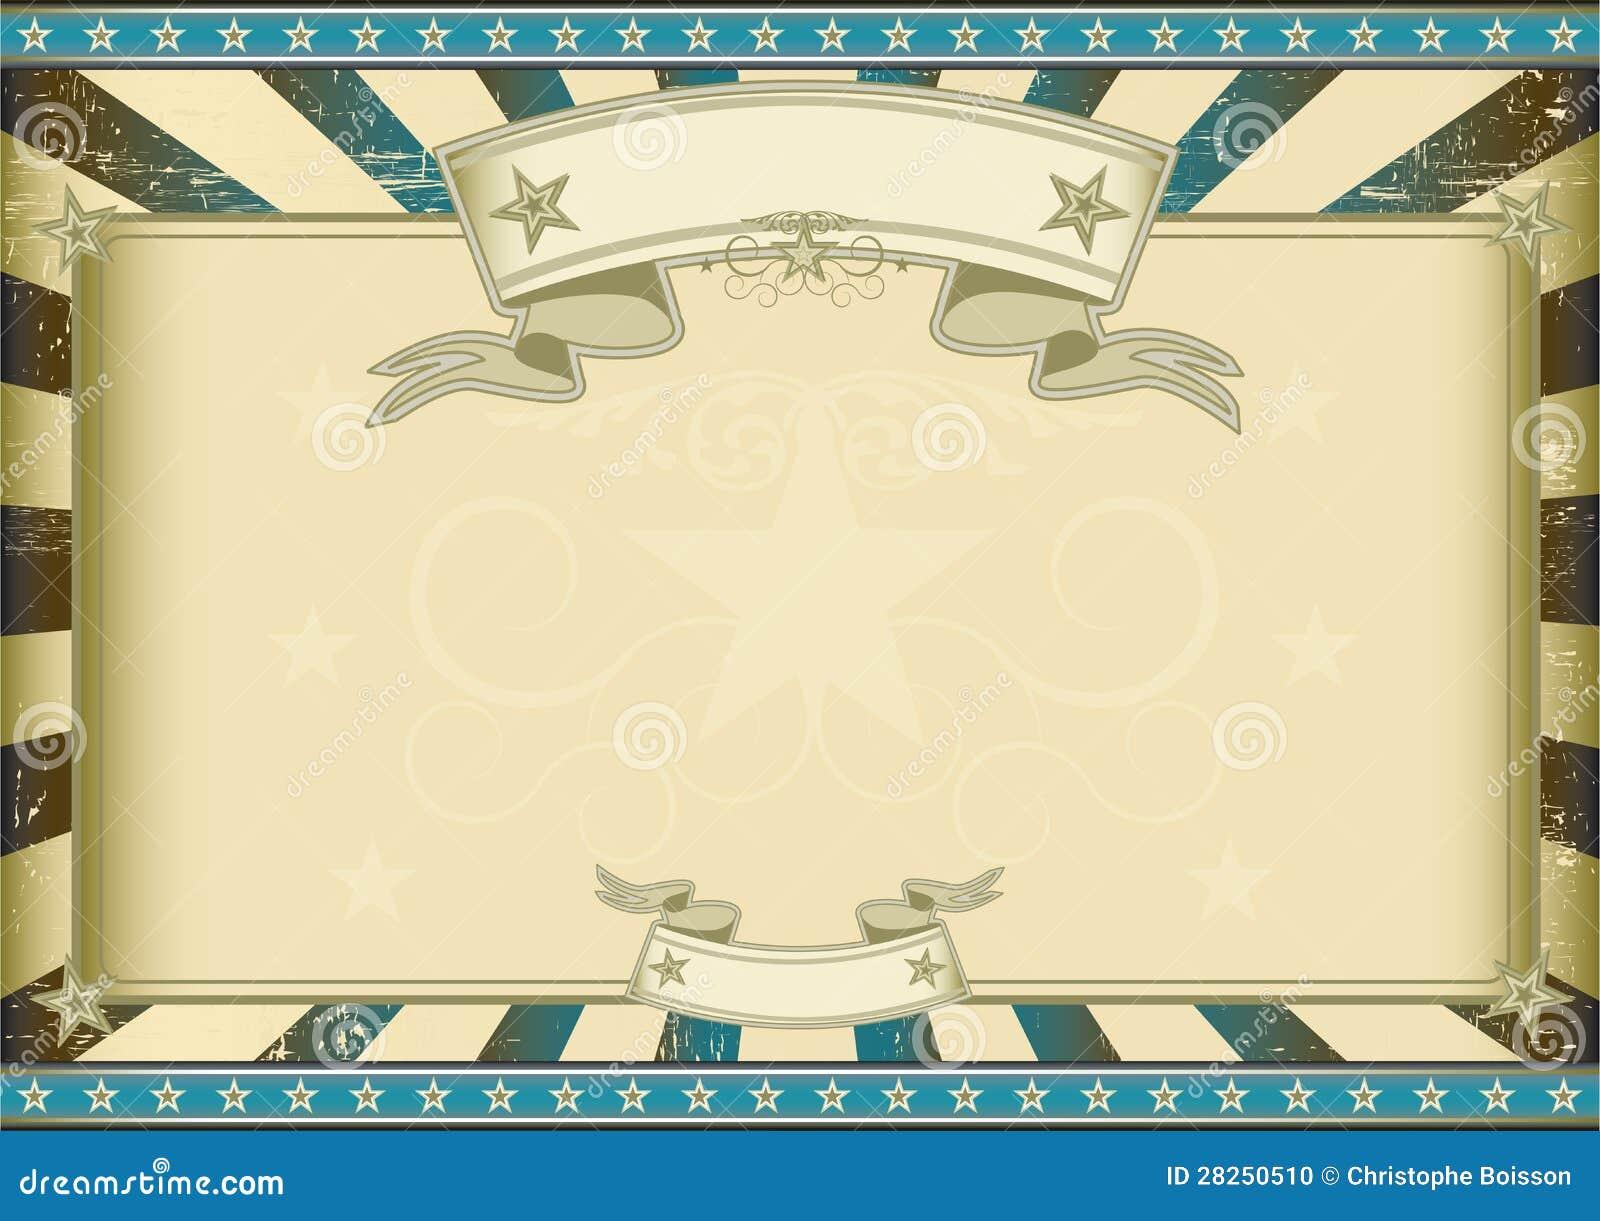 Textured Blue Retro Certificate Stock Photo Image 28250510